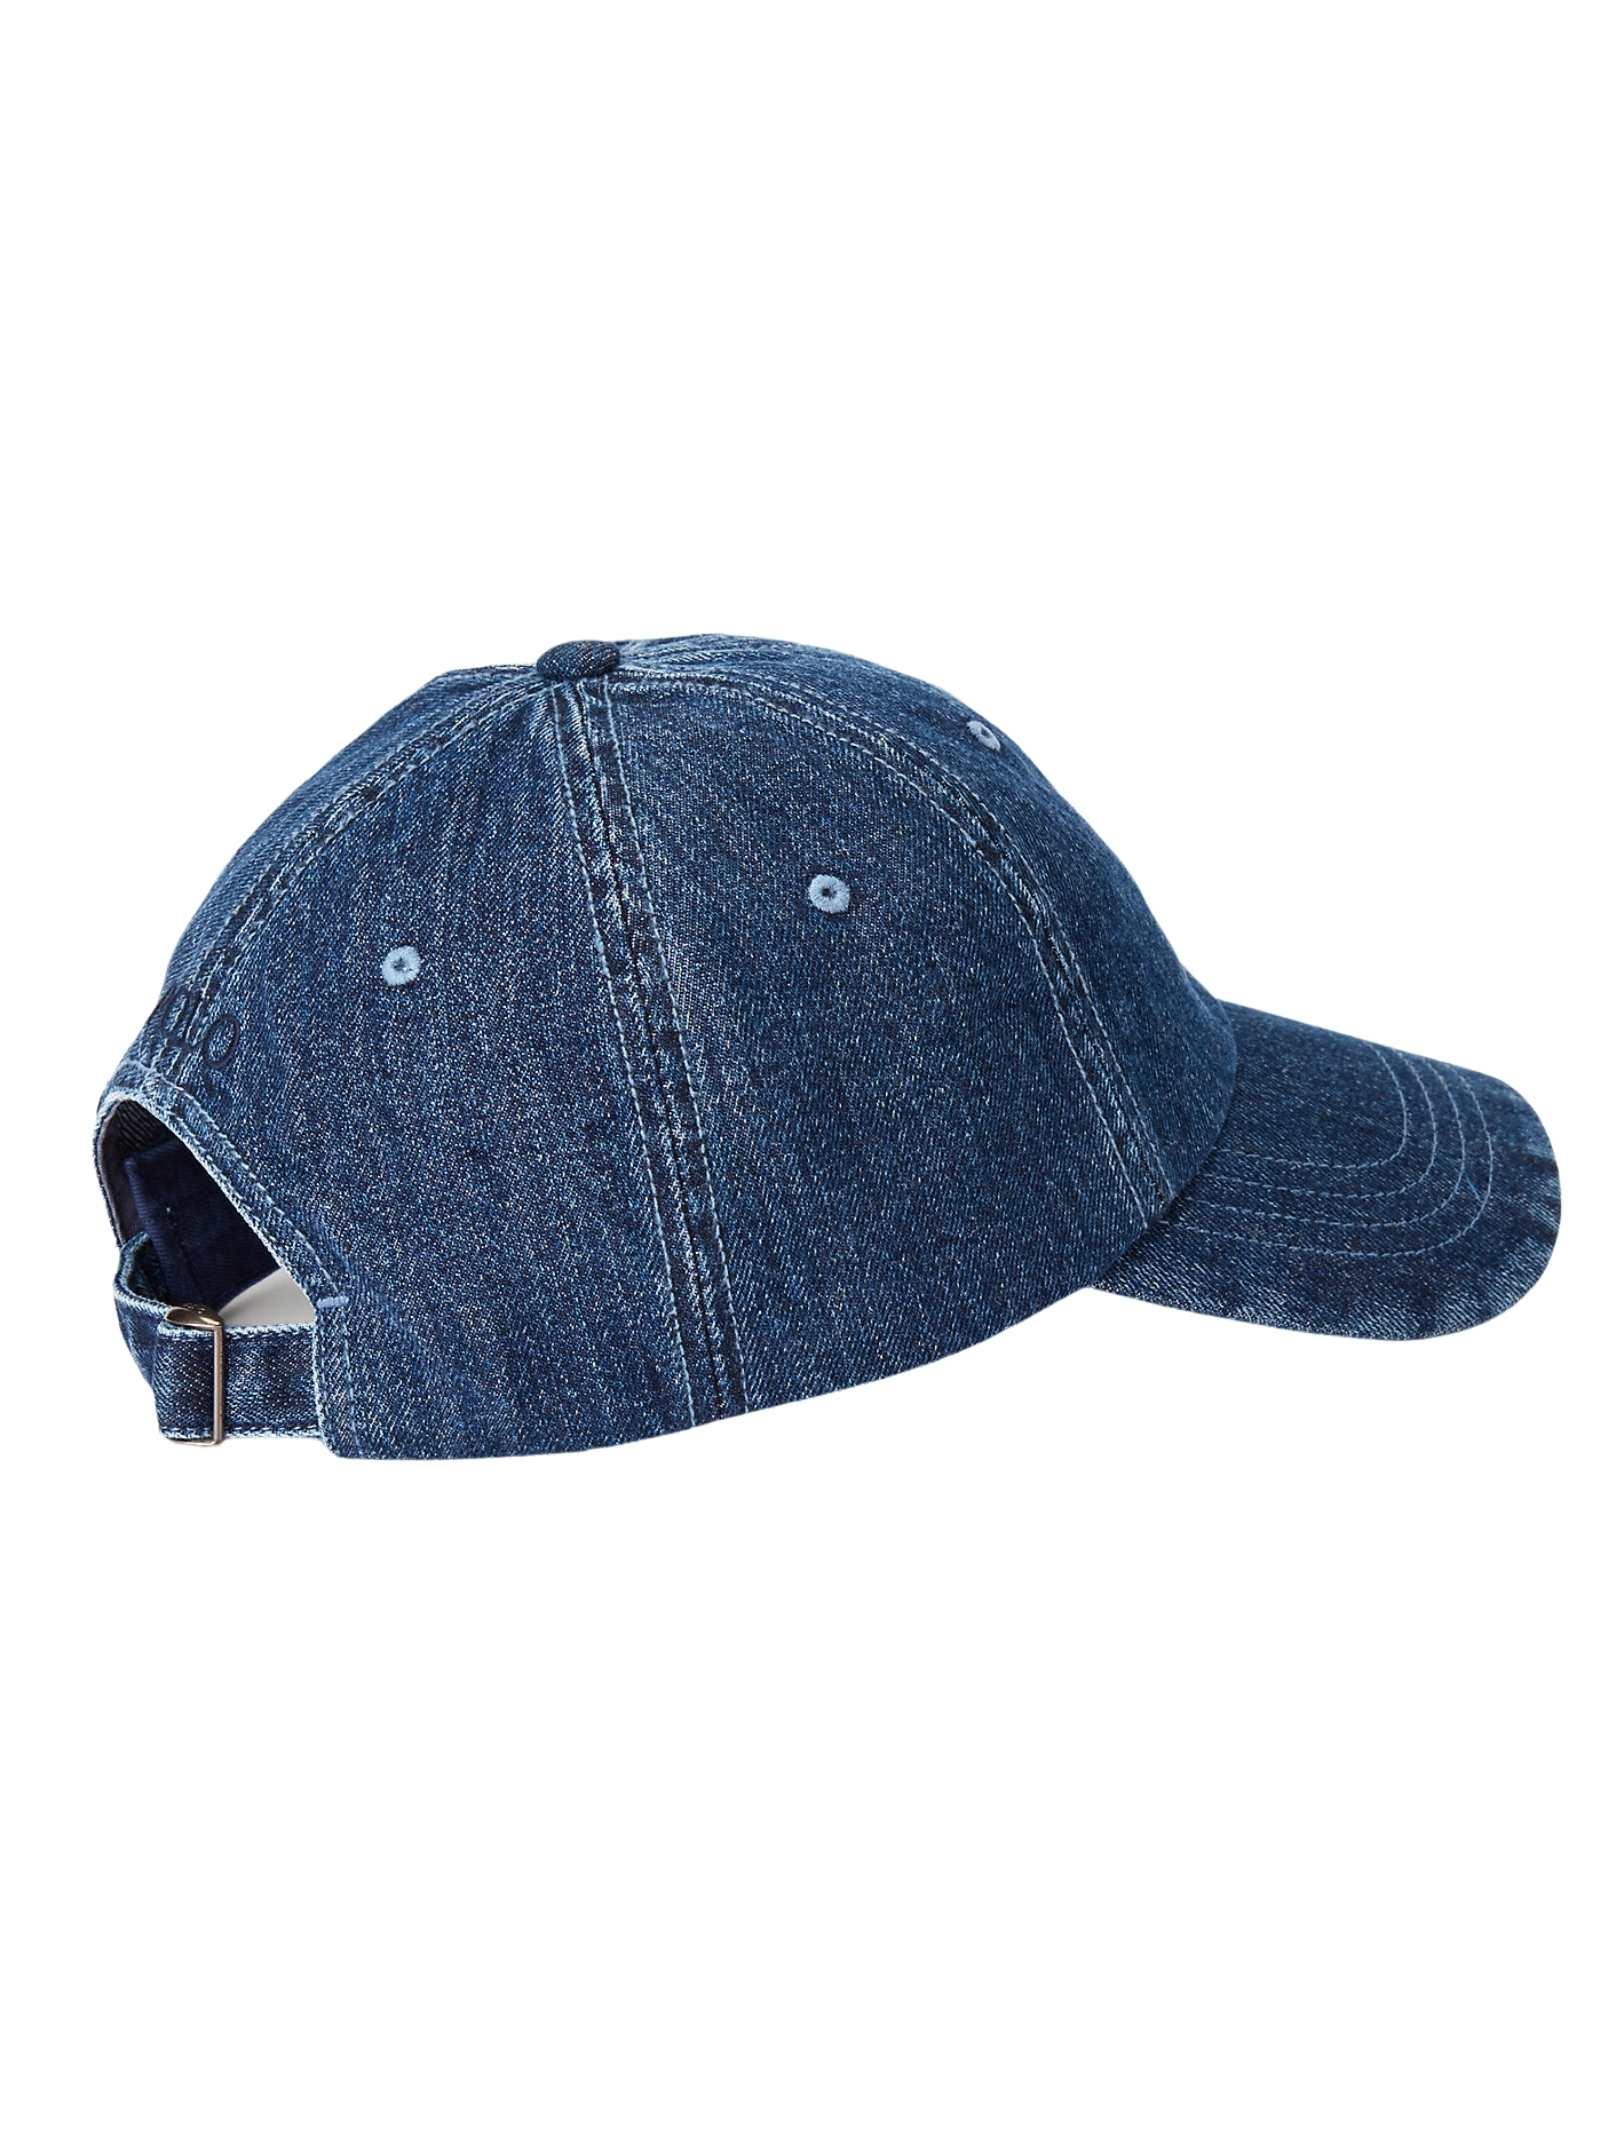 Cappello in jeans con logo RALPH LAUREN   Cappello   710-674341001